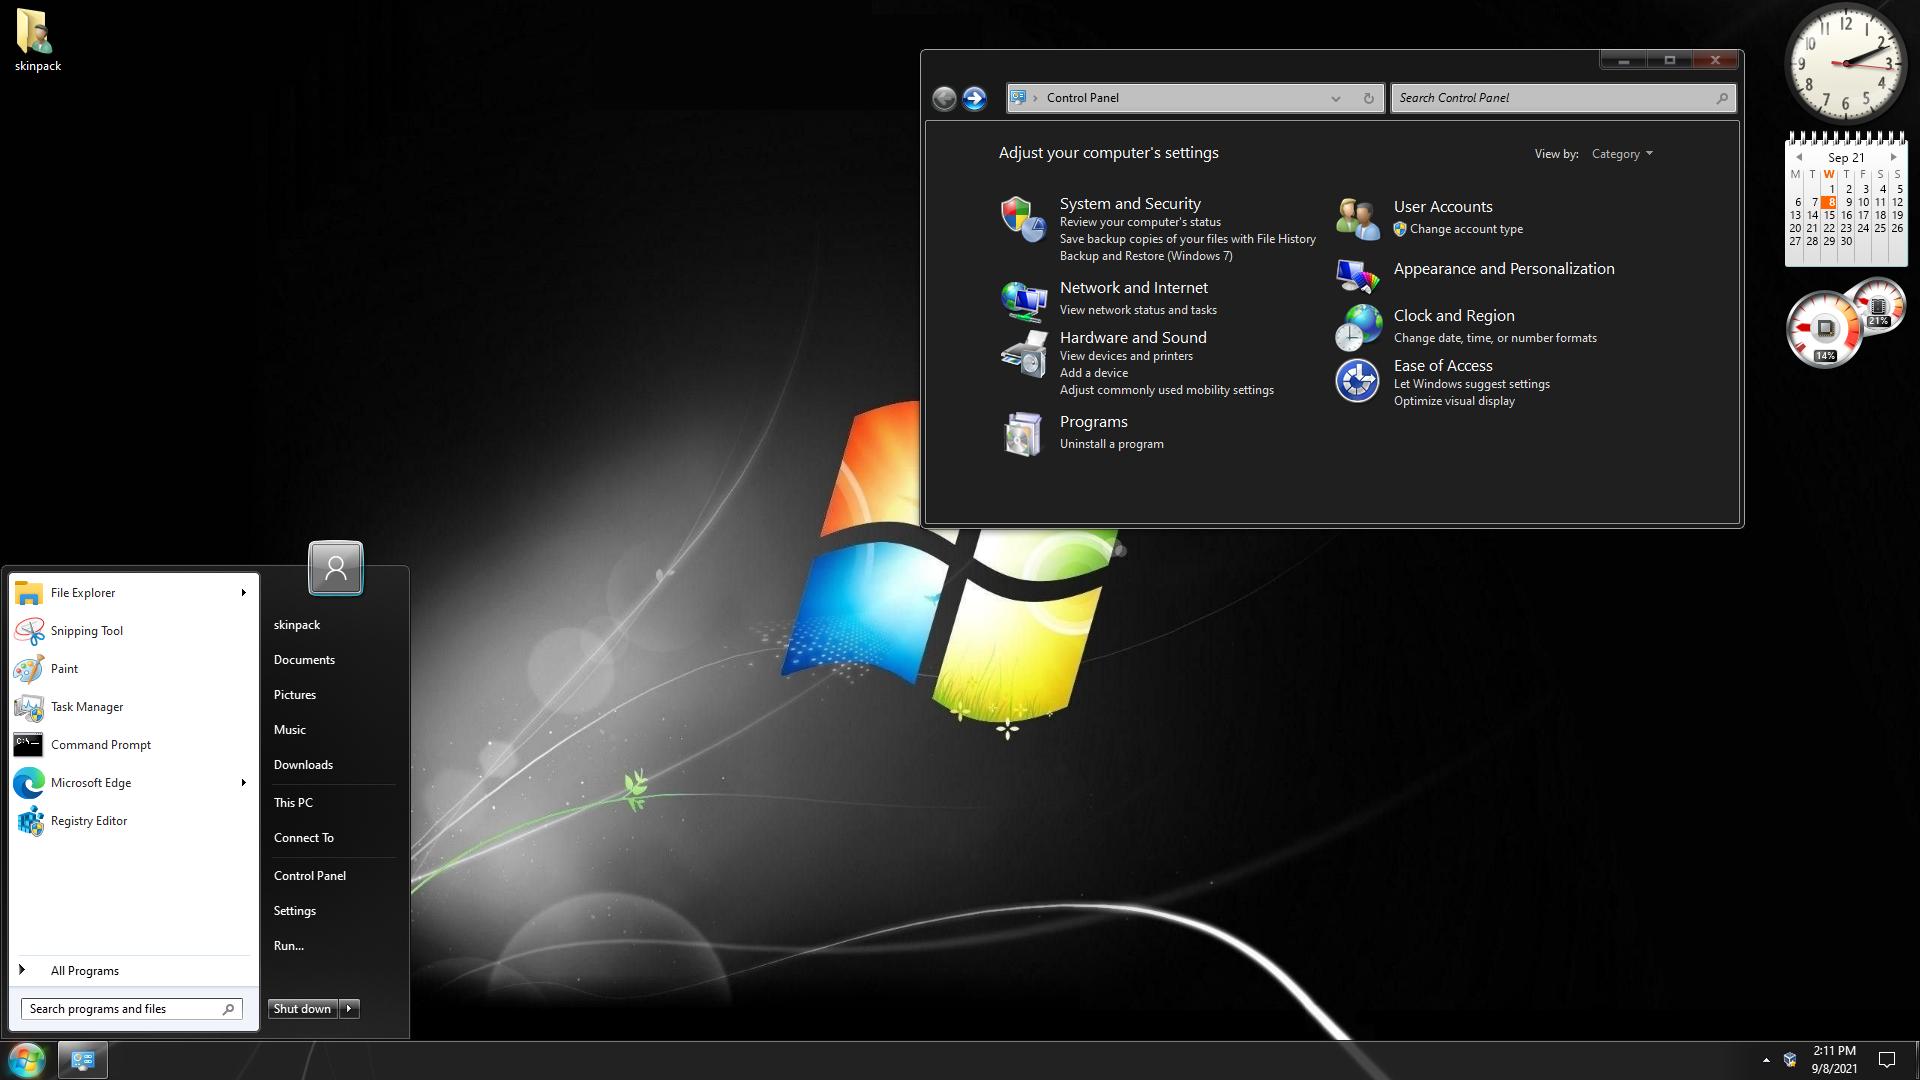 Windows 7 Dark Skin Pack for Windows 10